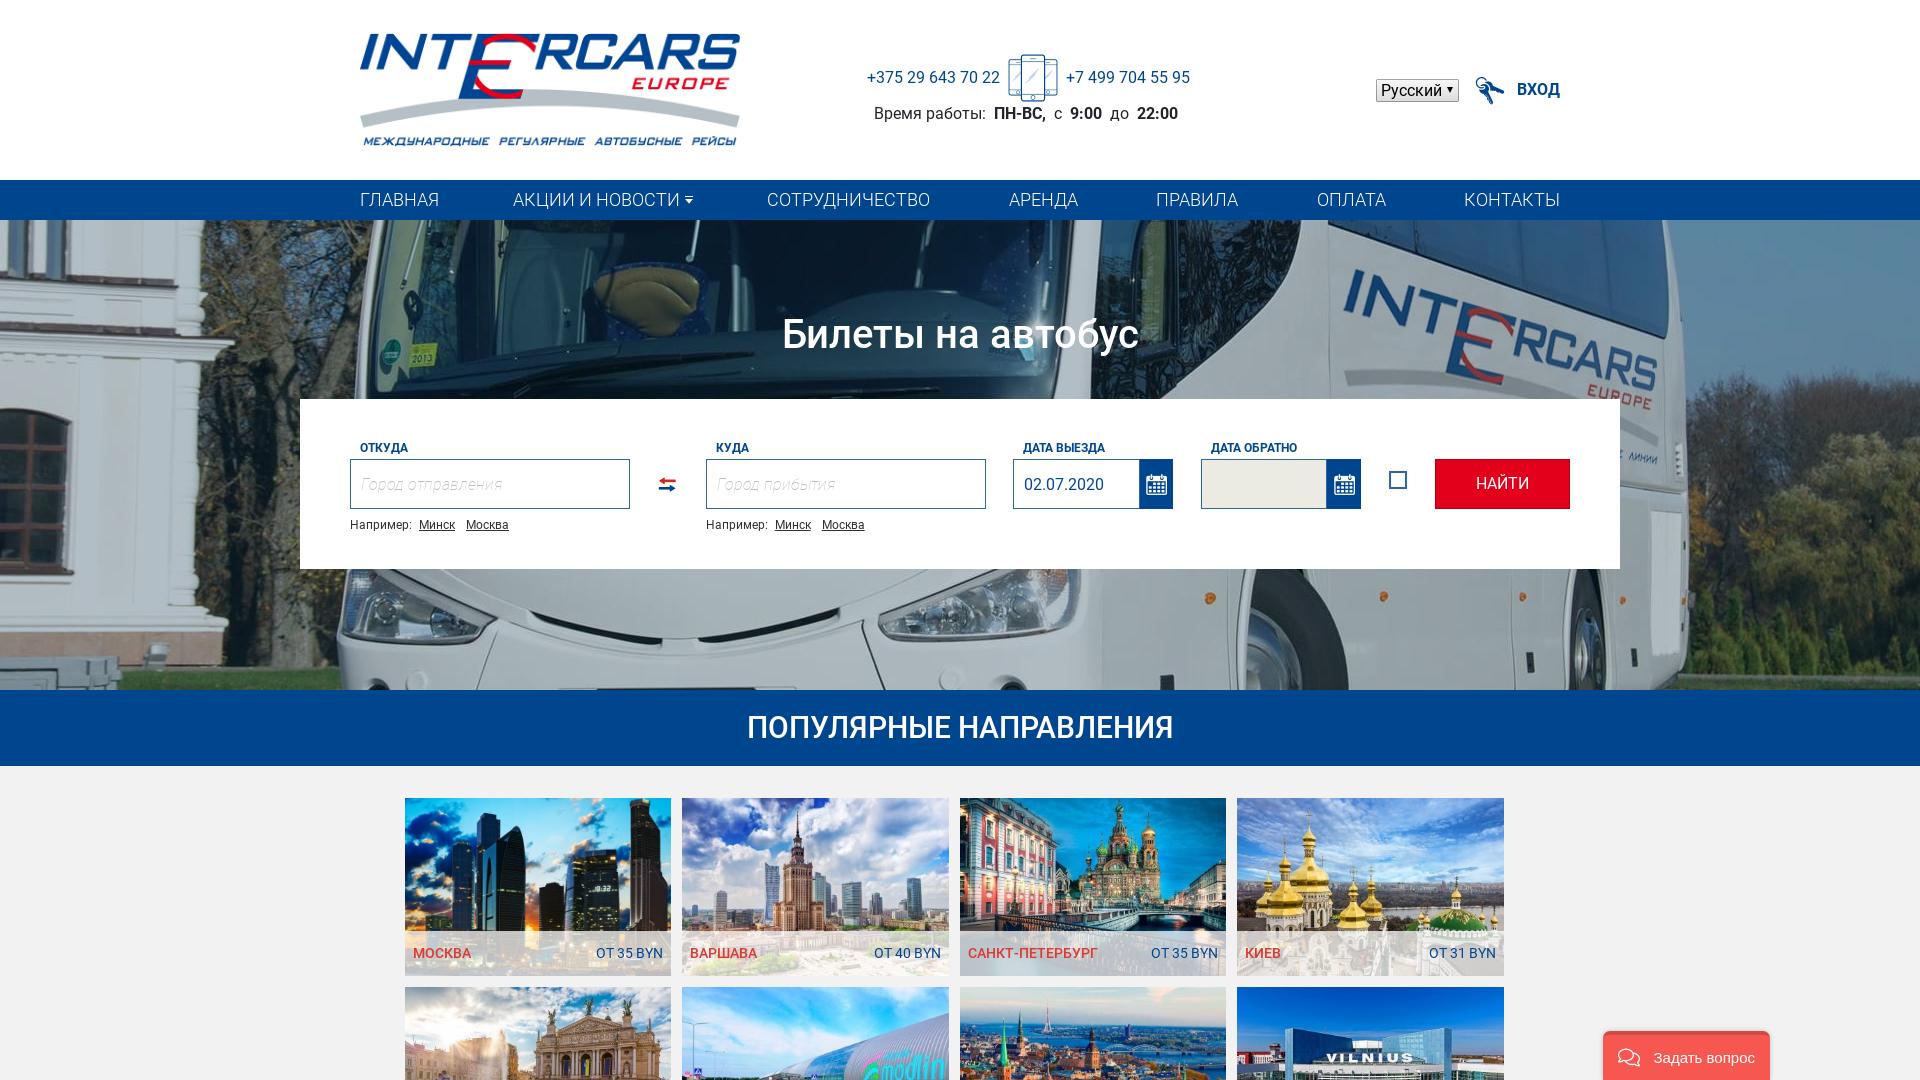 Intercars-tickets Many GEOs website